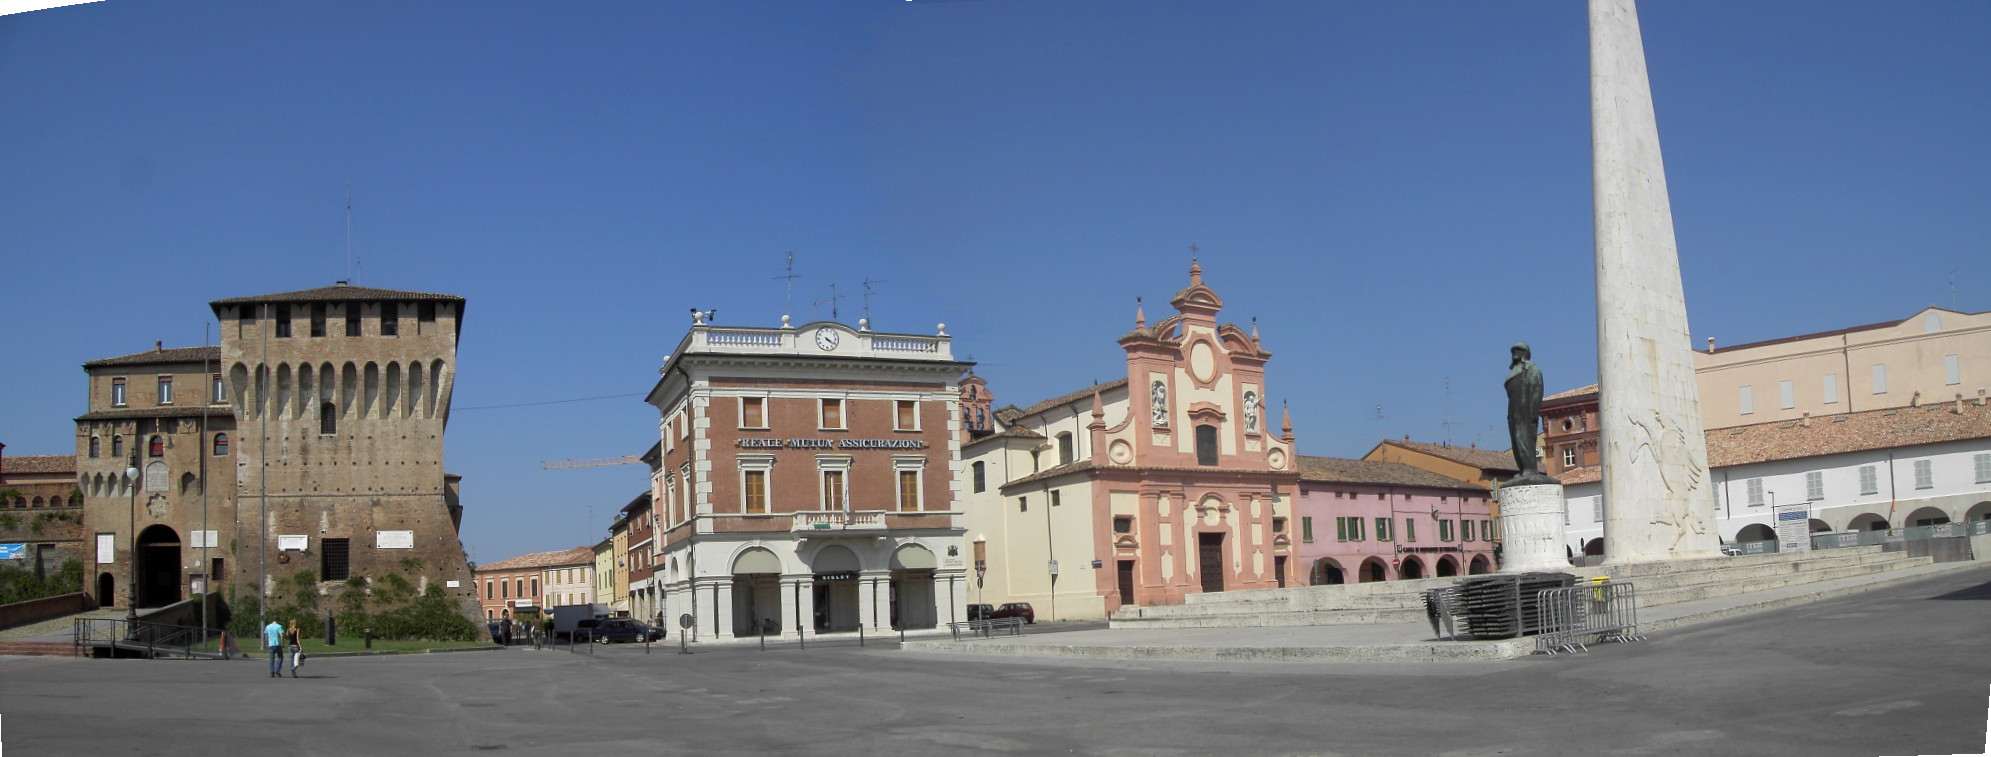 La_piazza_del_mercato_%28Lugo%2C_Italy%29.jpg